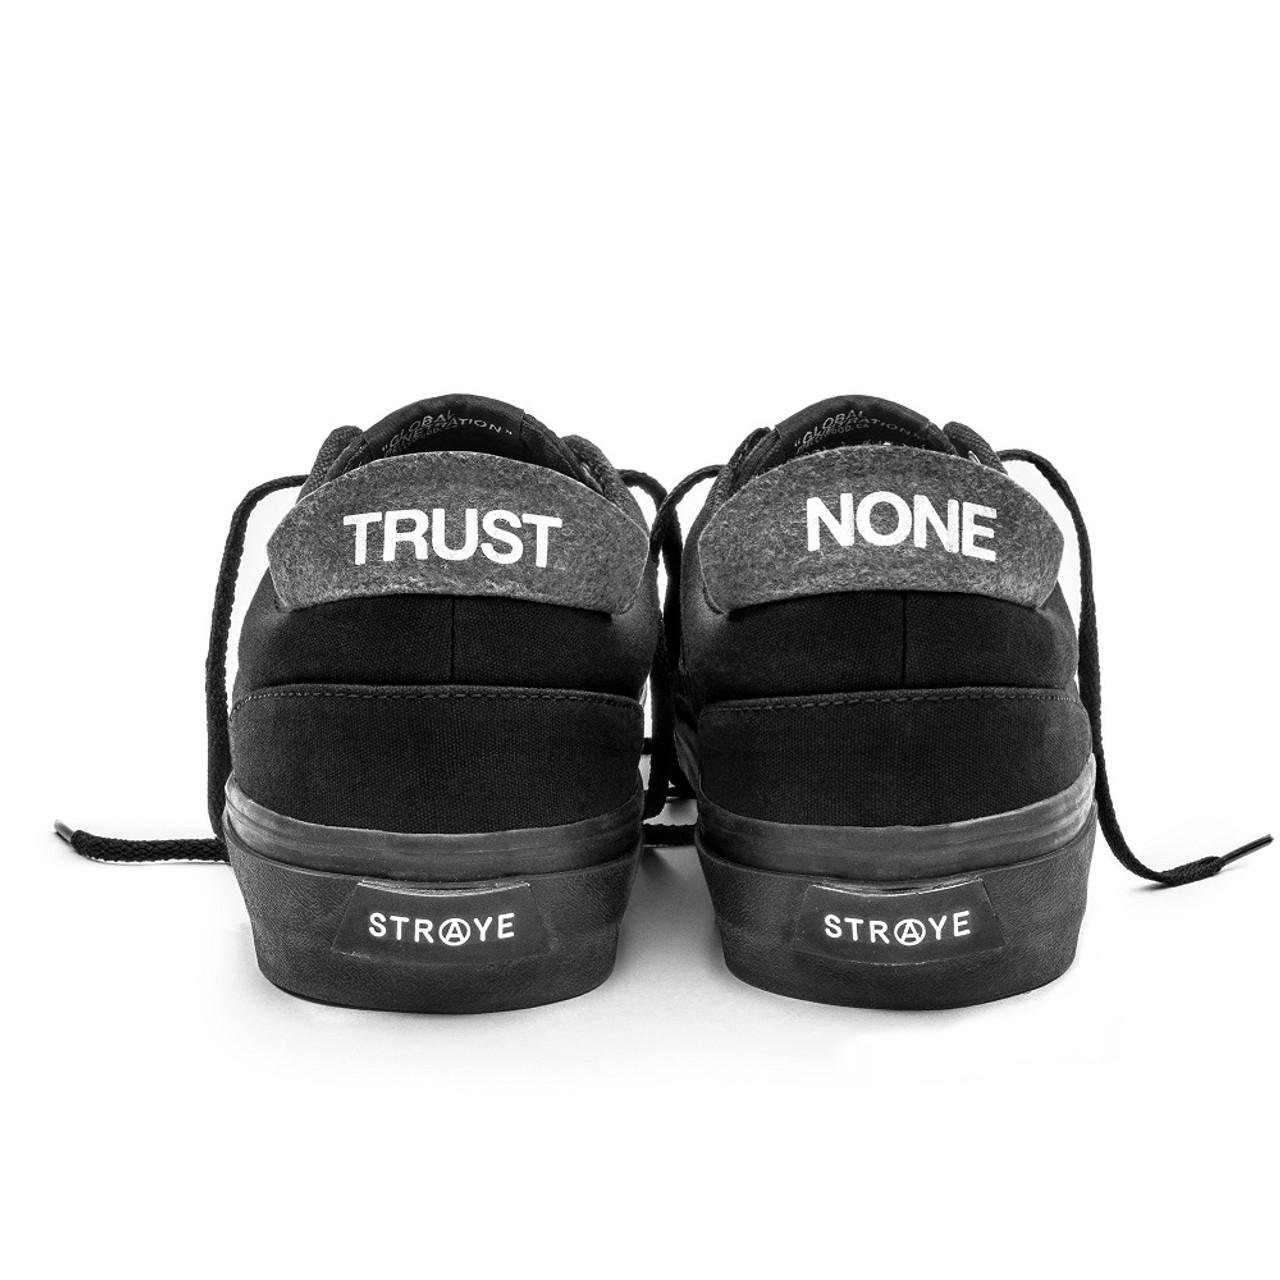 Straye Fairfax Suede Shoes Black Black  2c07e27bbca